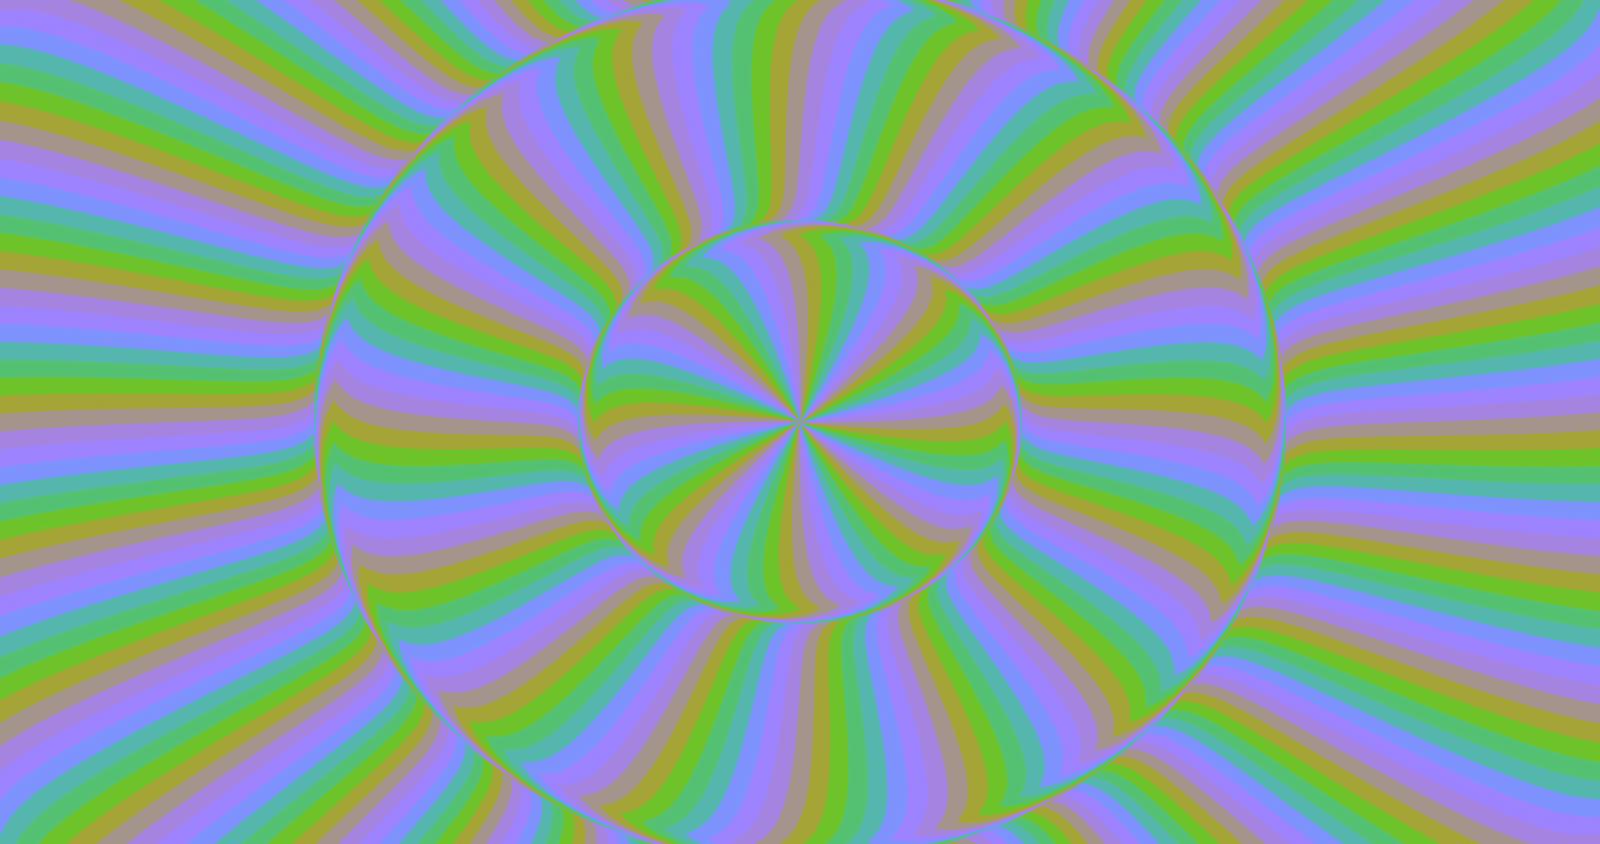 Rotation - Optical illusion by H-Flaieh